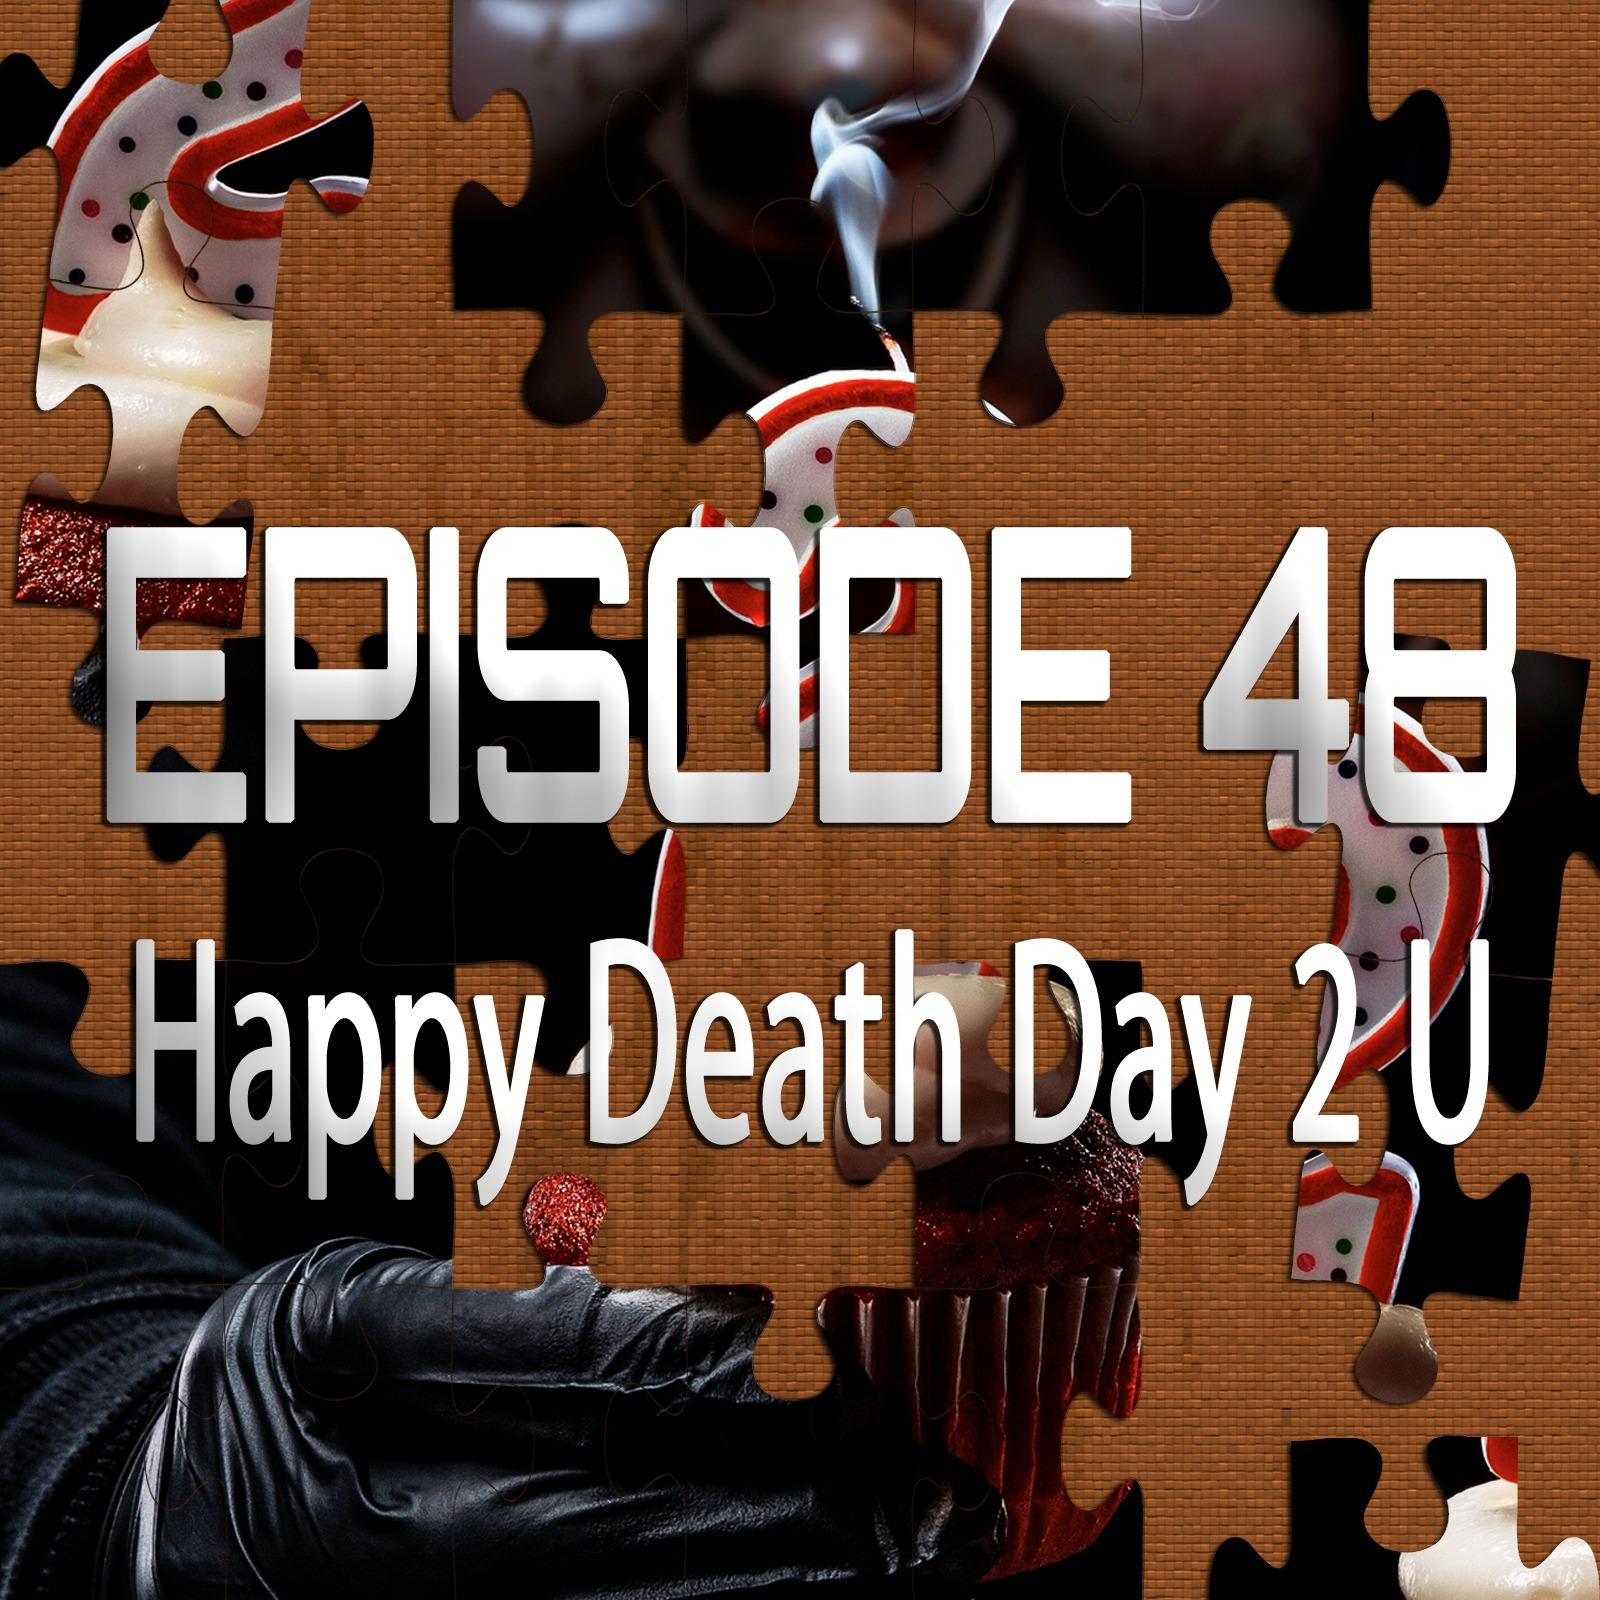 Happy Death Day 2 U (Featuring Josh Bell)